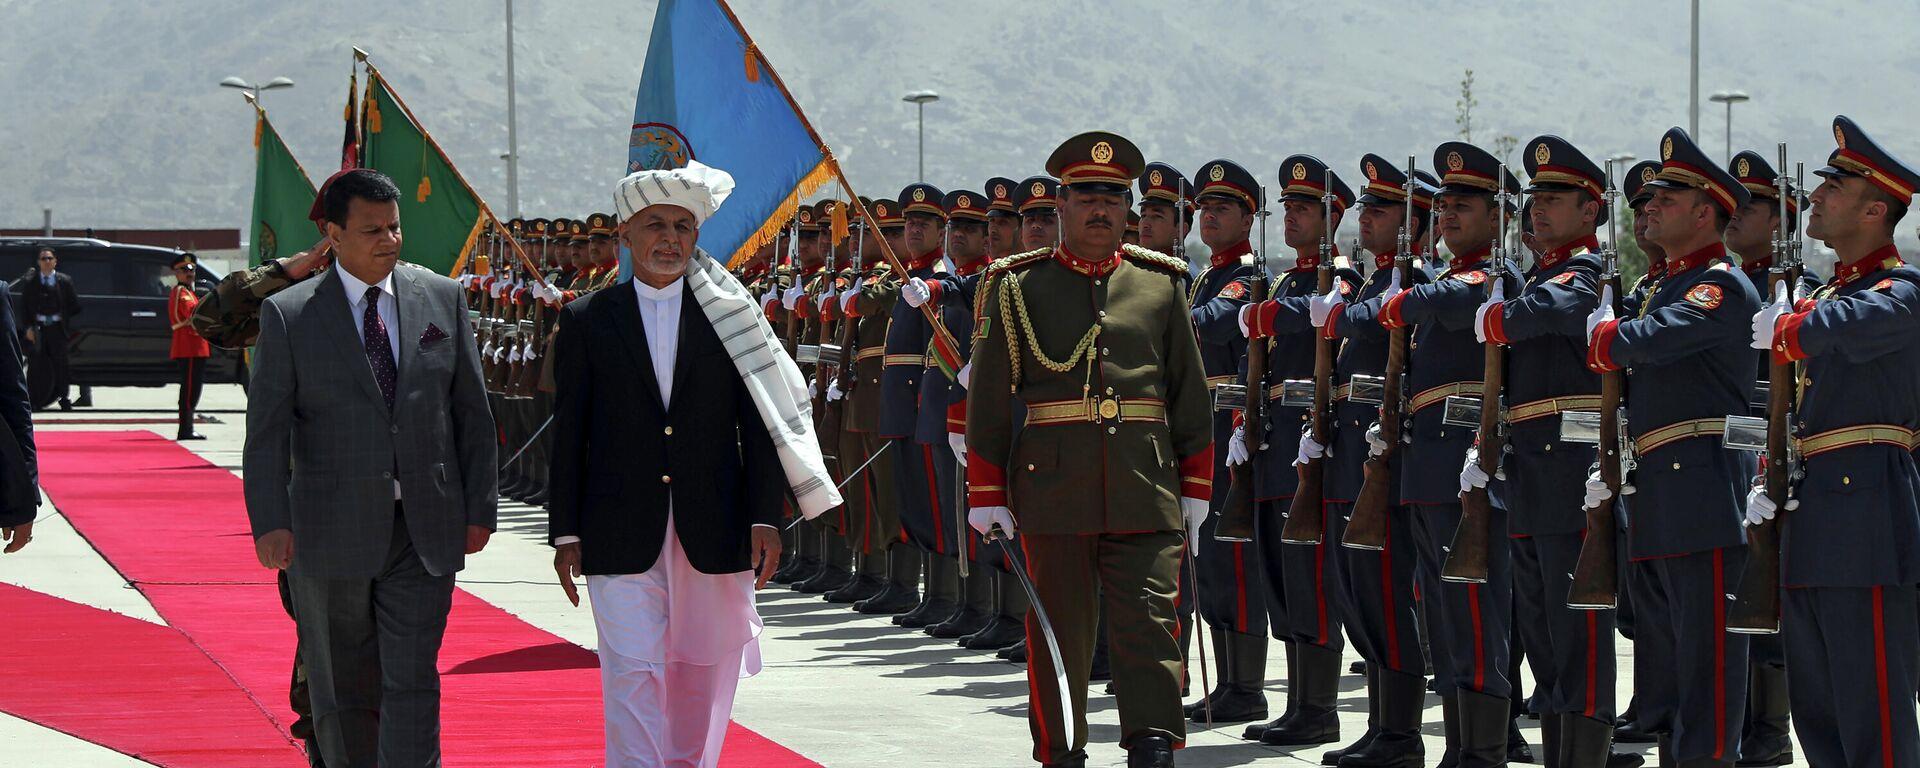 Prezident Afganistana Ashraf Gani - Sputnik Oʻzbekiston, 1920, 02.08.2021